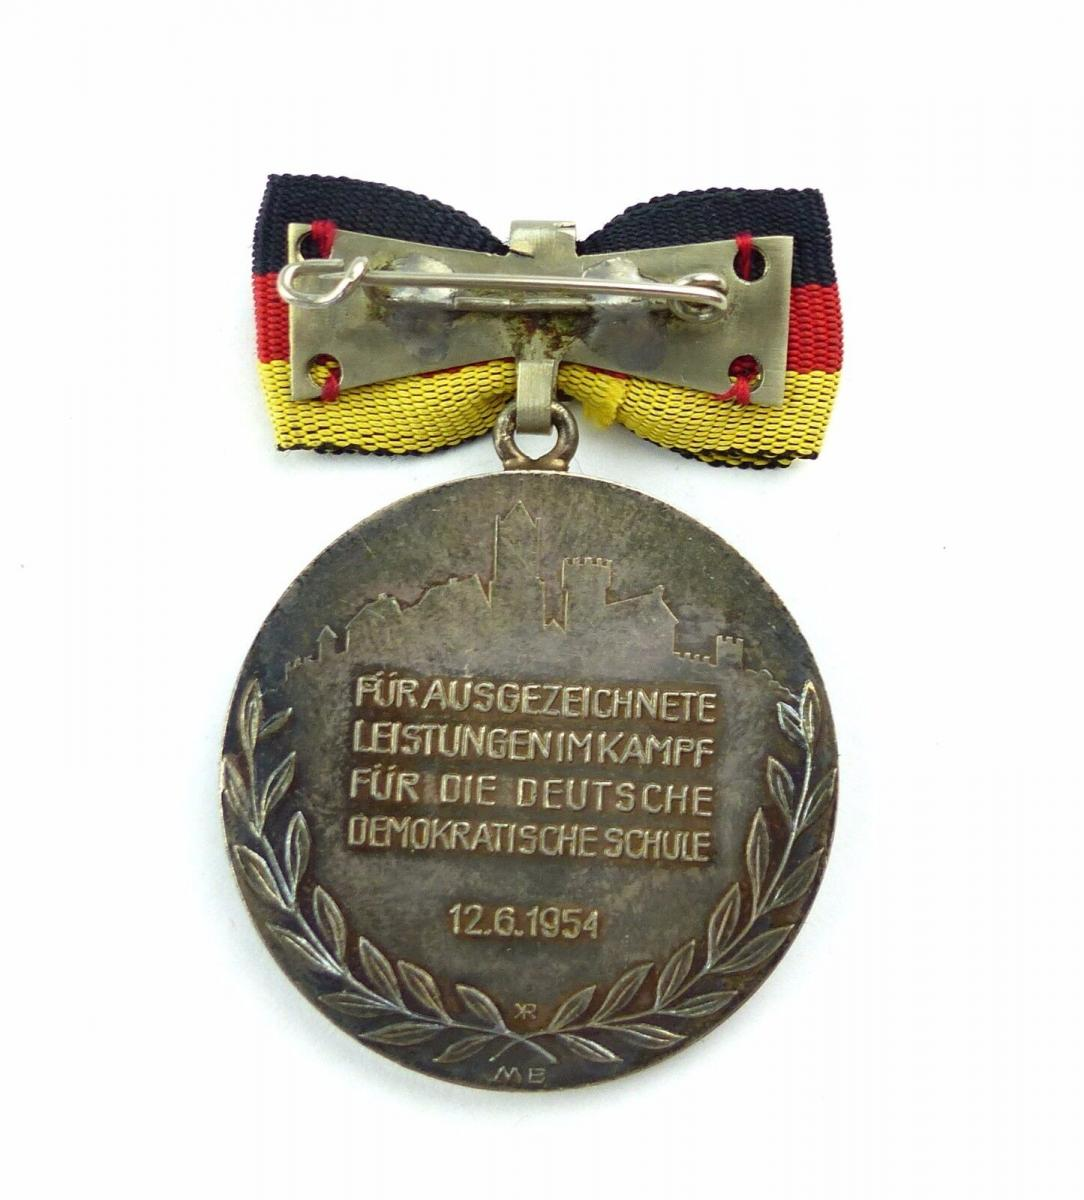 #e7761 Carl-Friedrich-Wilhelm-Wander-Medaille Silber 900 vgl. Nr. 130 (1954-55) 3